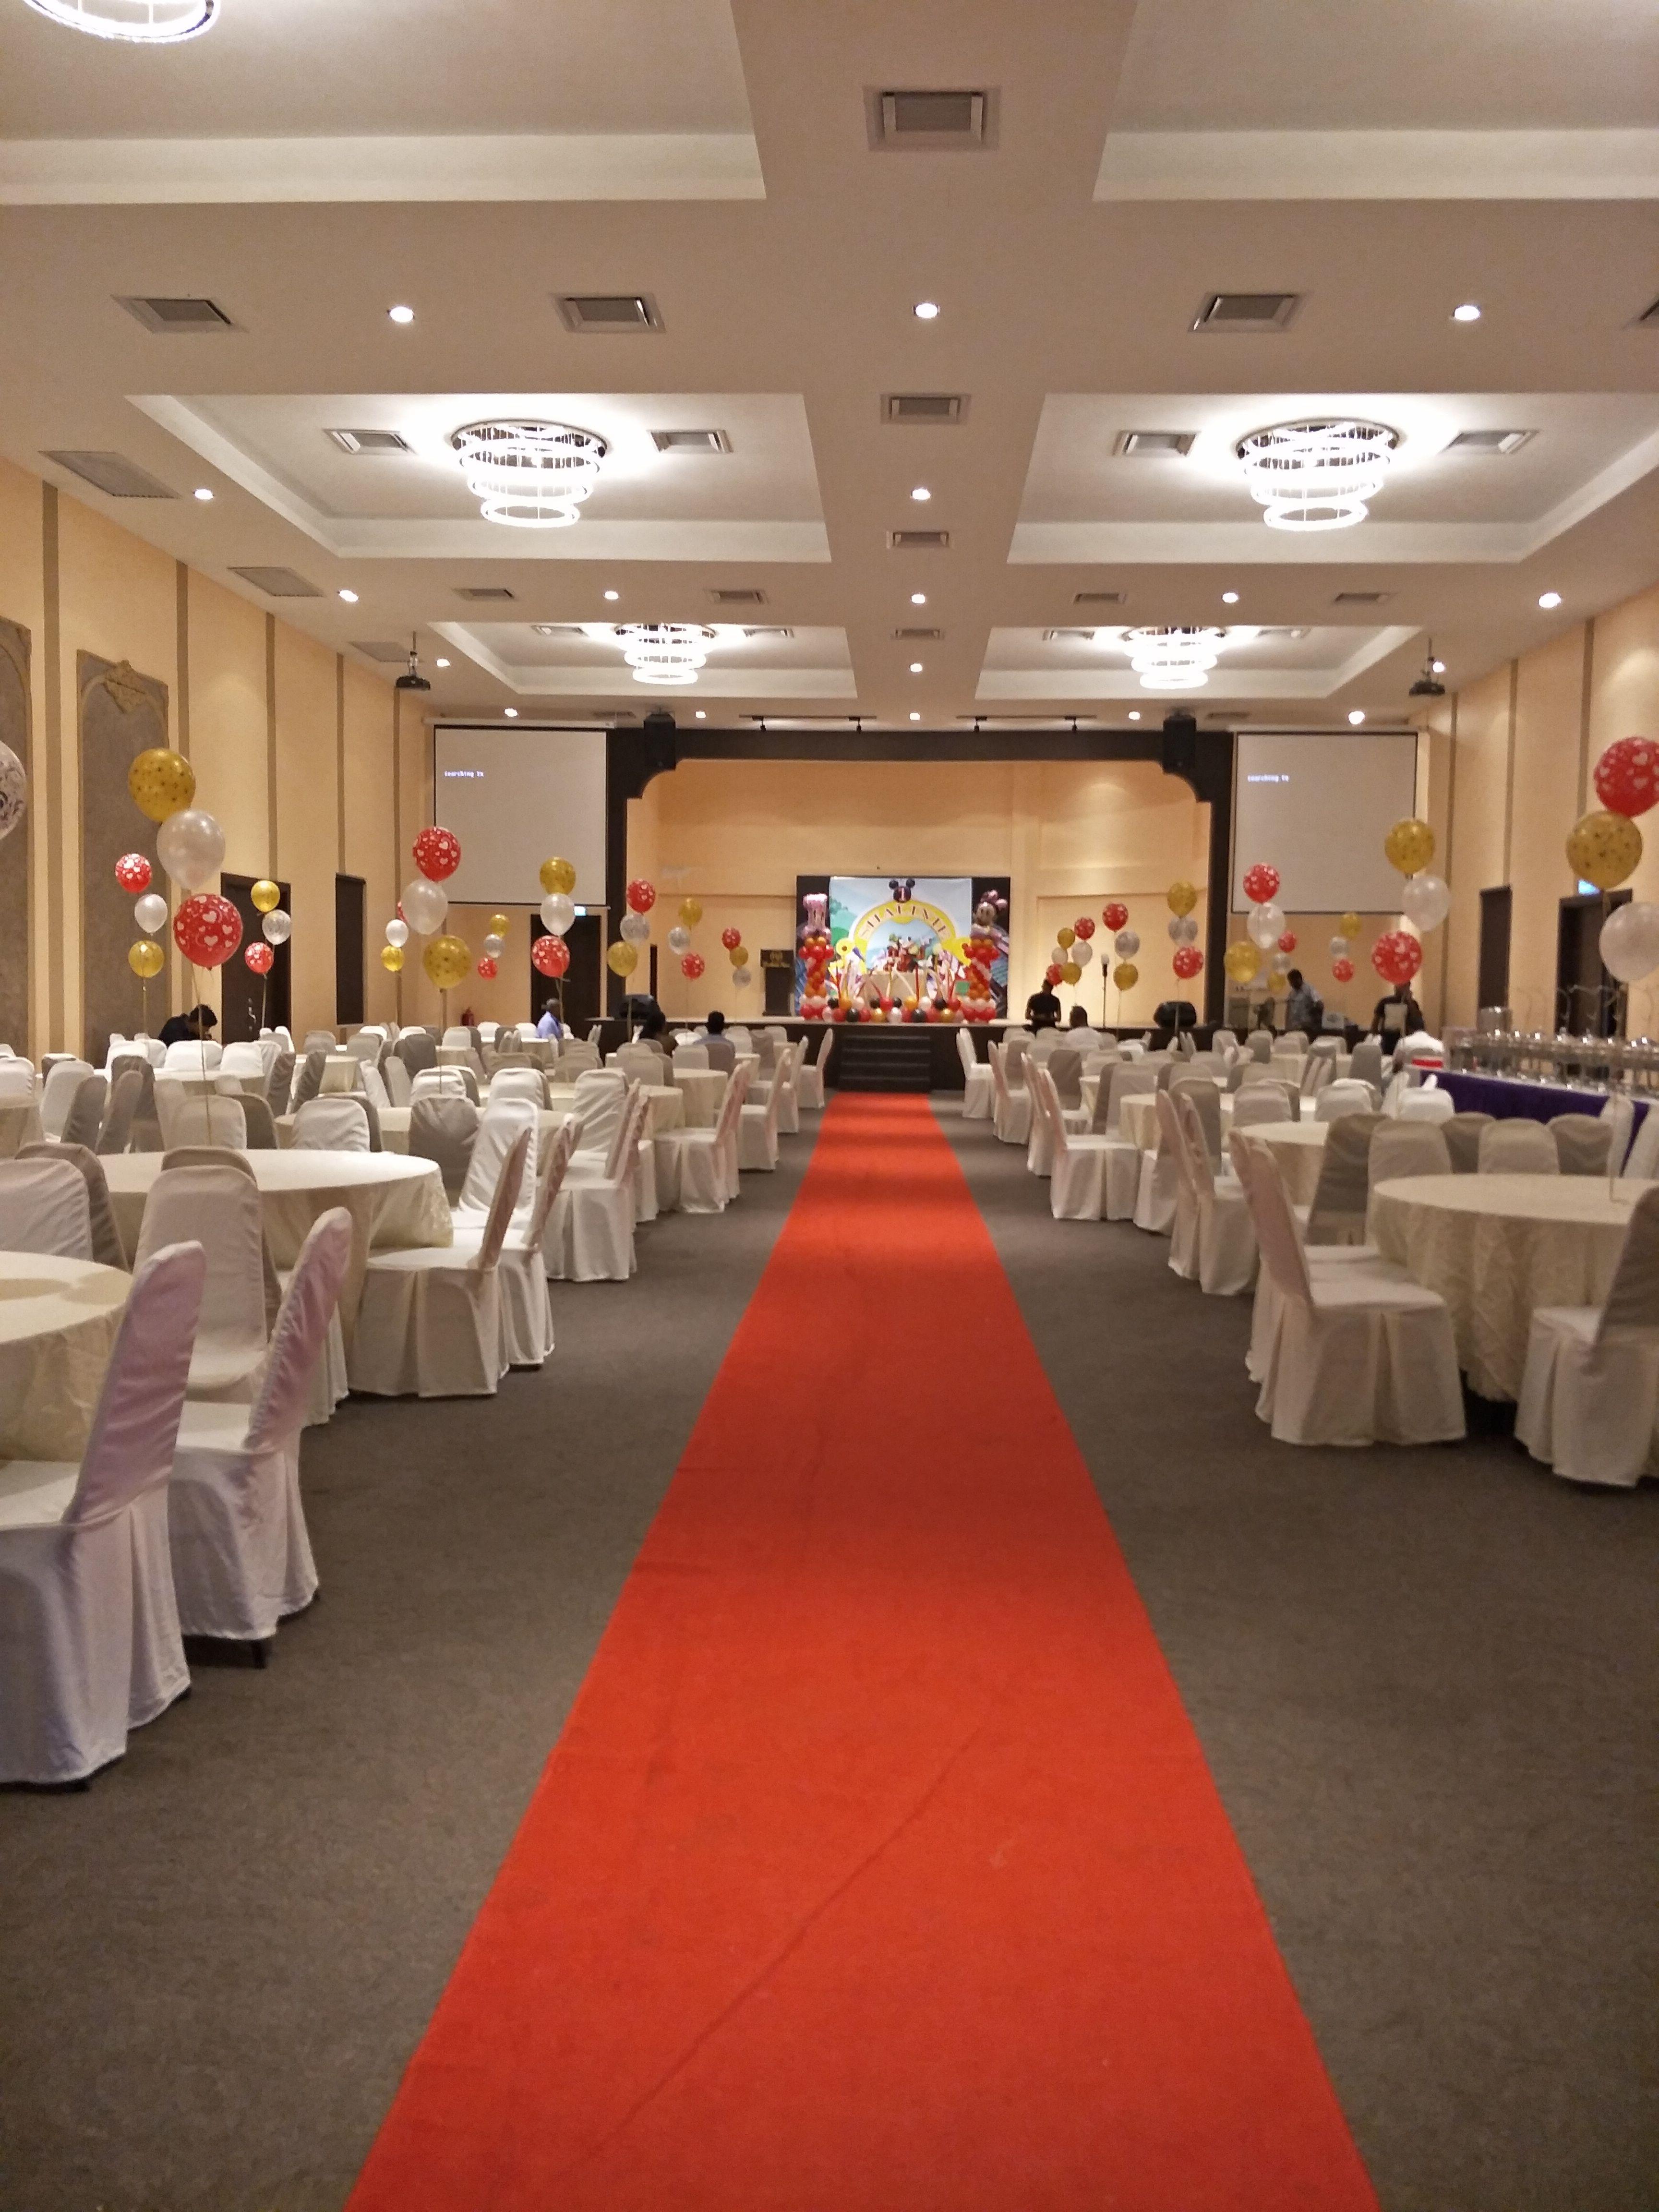 Birthday parties at westlane place birthday party halls